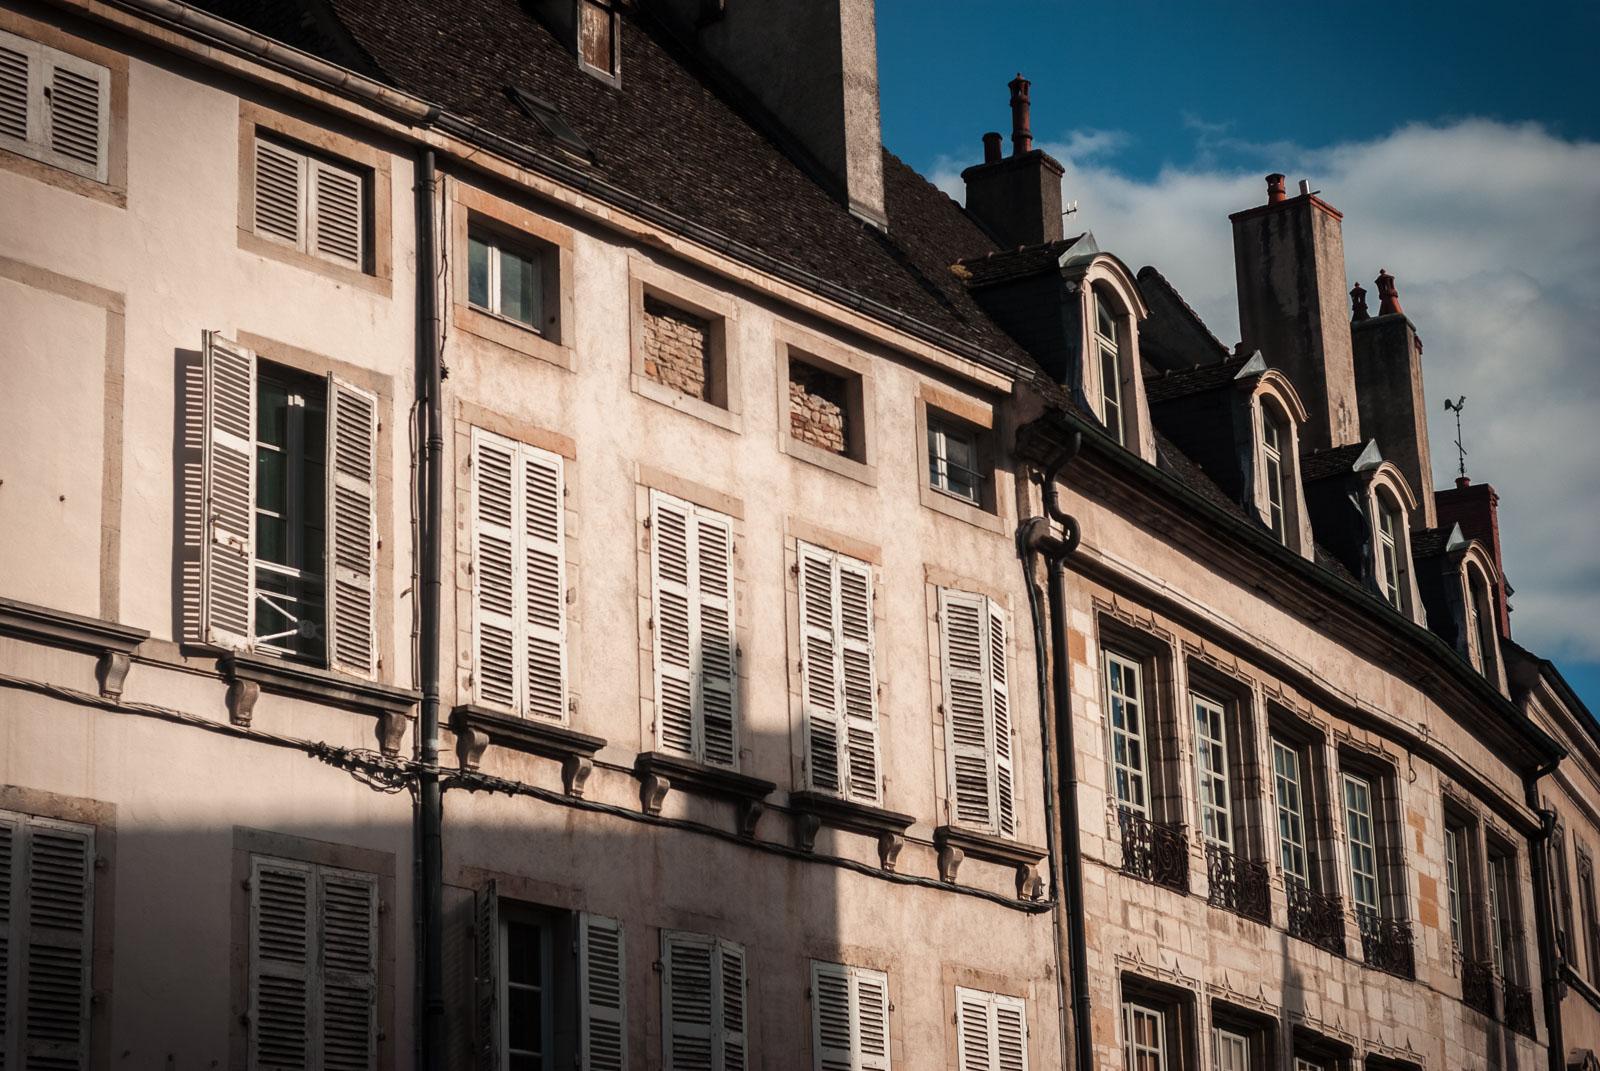 17_Paris-France-trip_Joseph-Barber-Photography.jpg